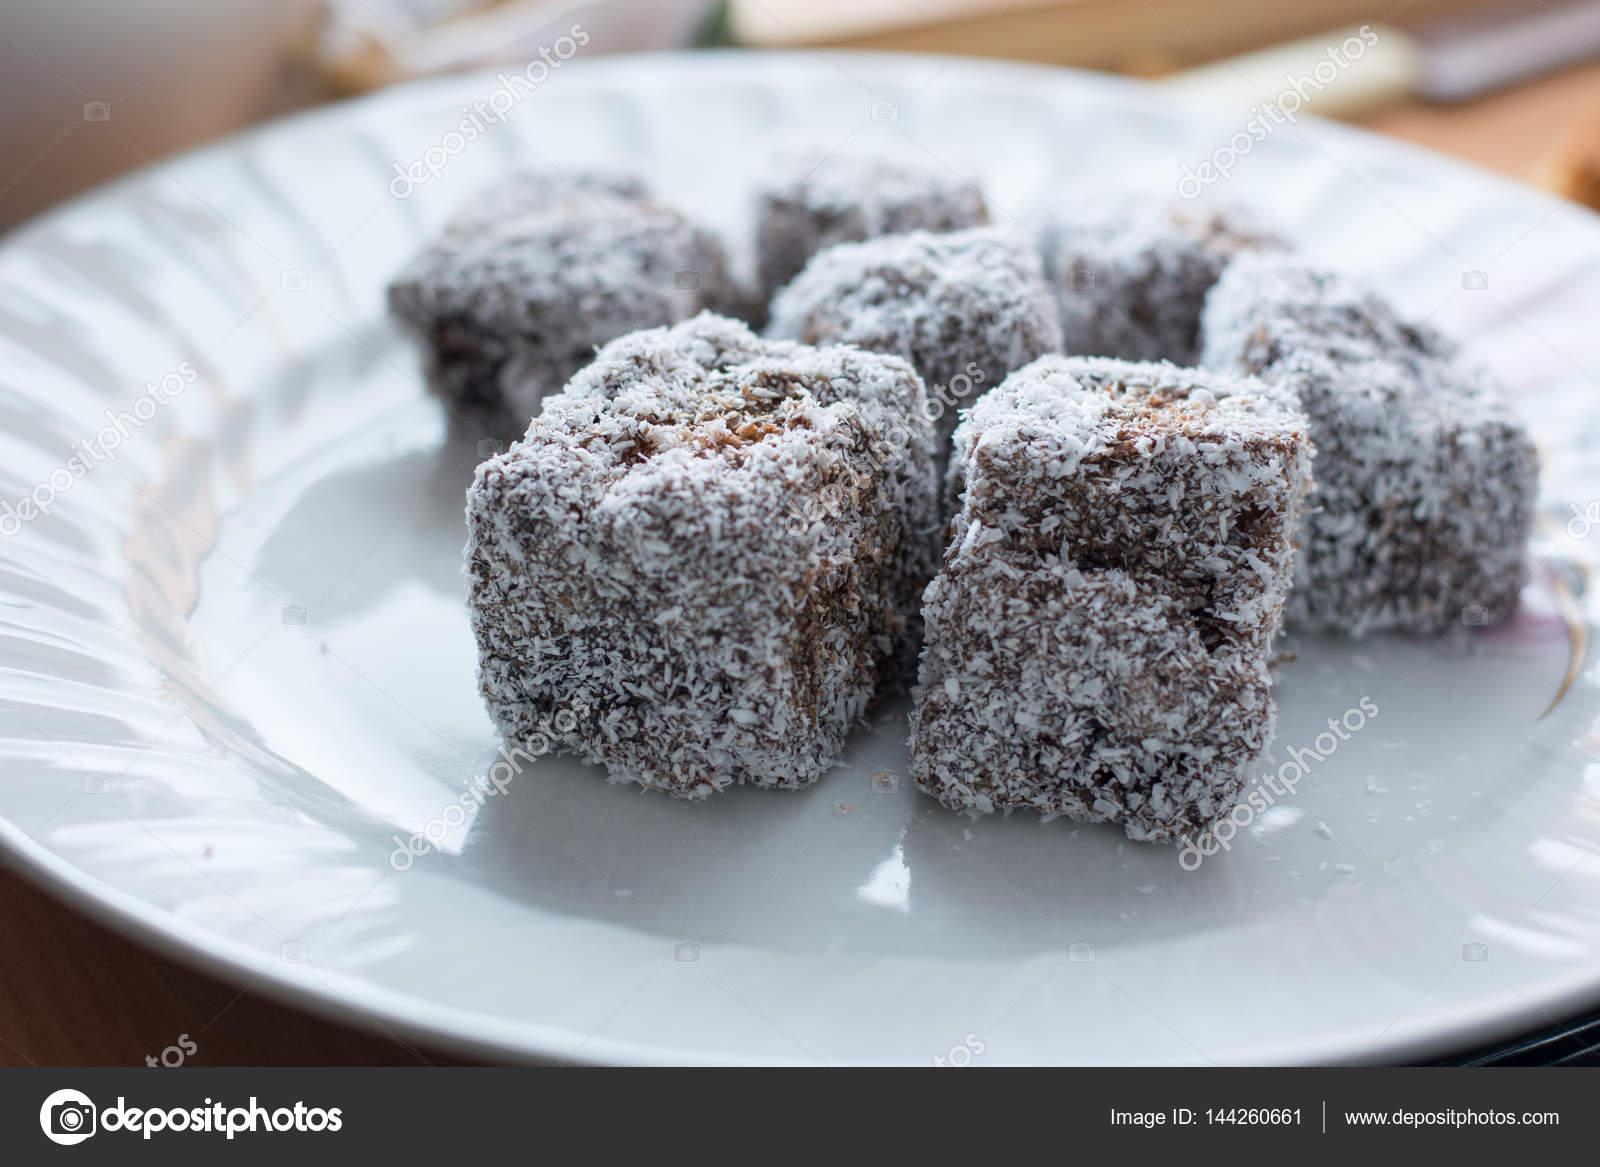 Nahaufnahme Von Schokolade Kuchen Mit Kokosmehl Stockfoto C Radebg